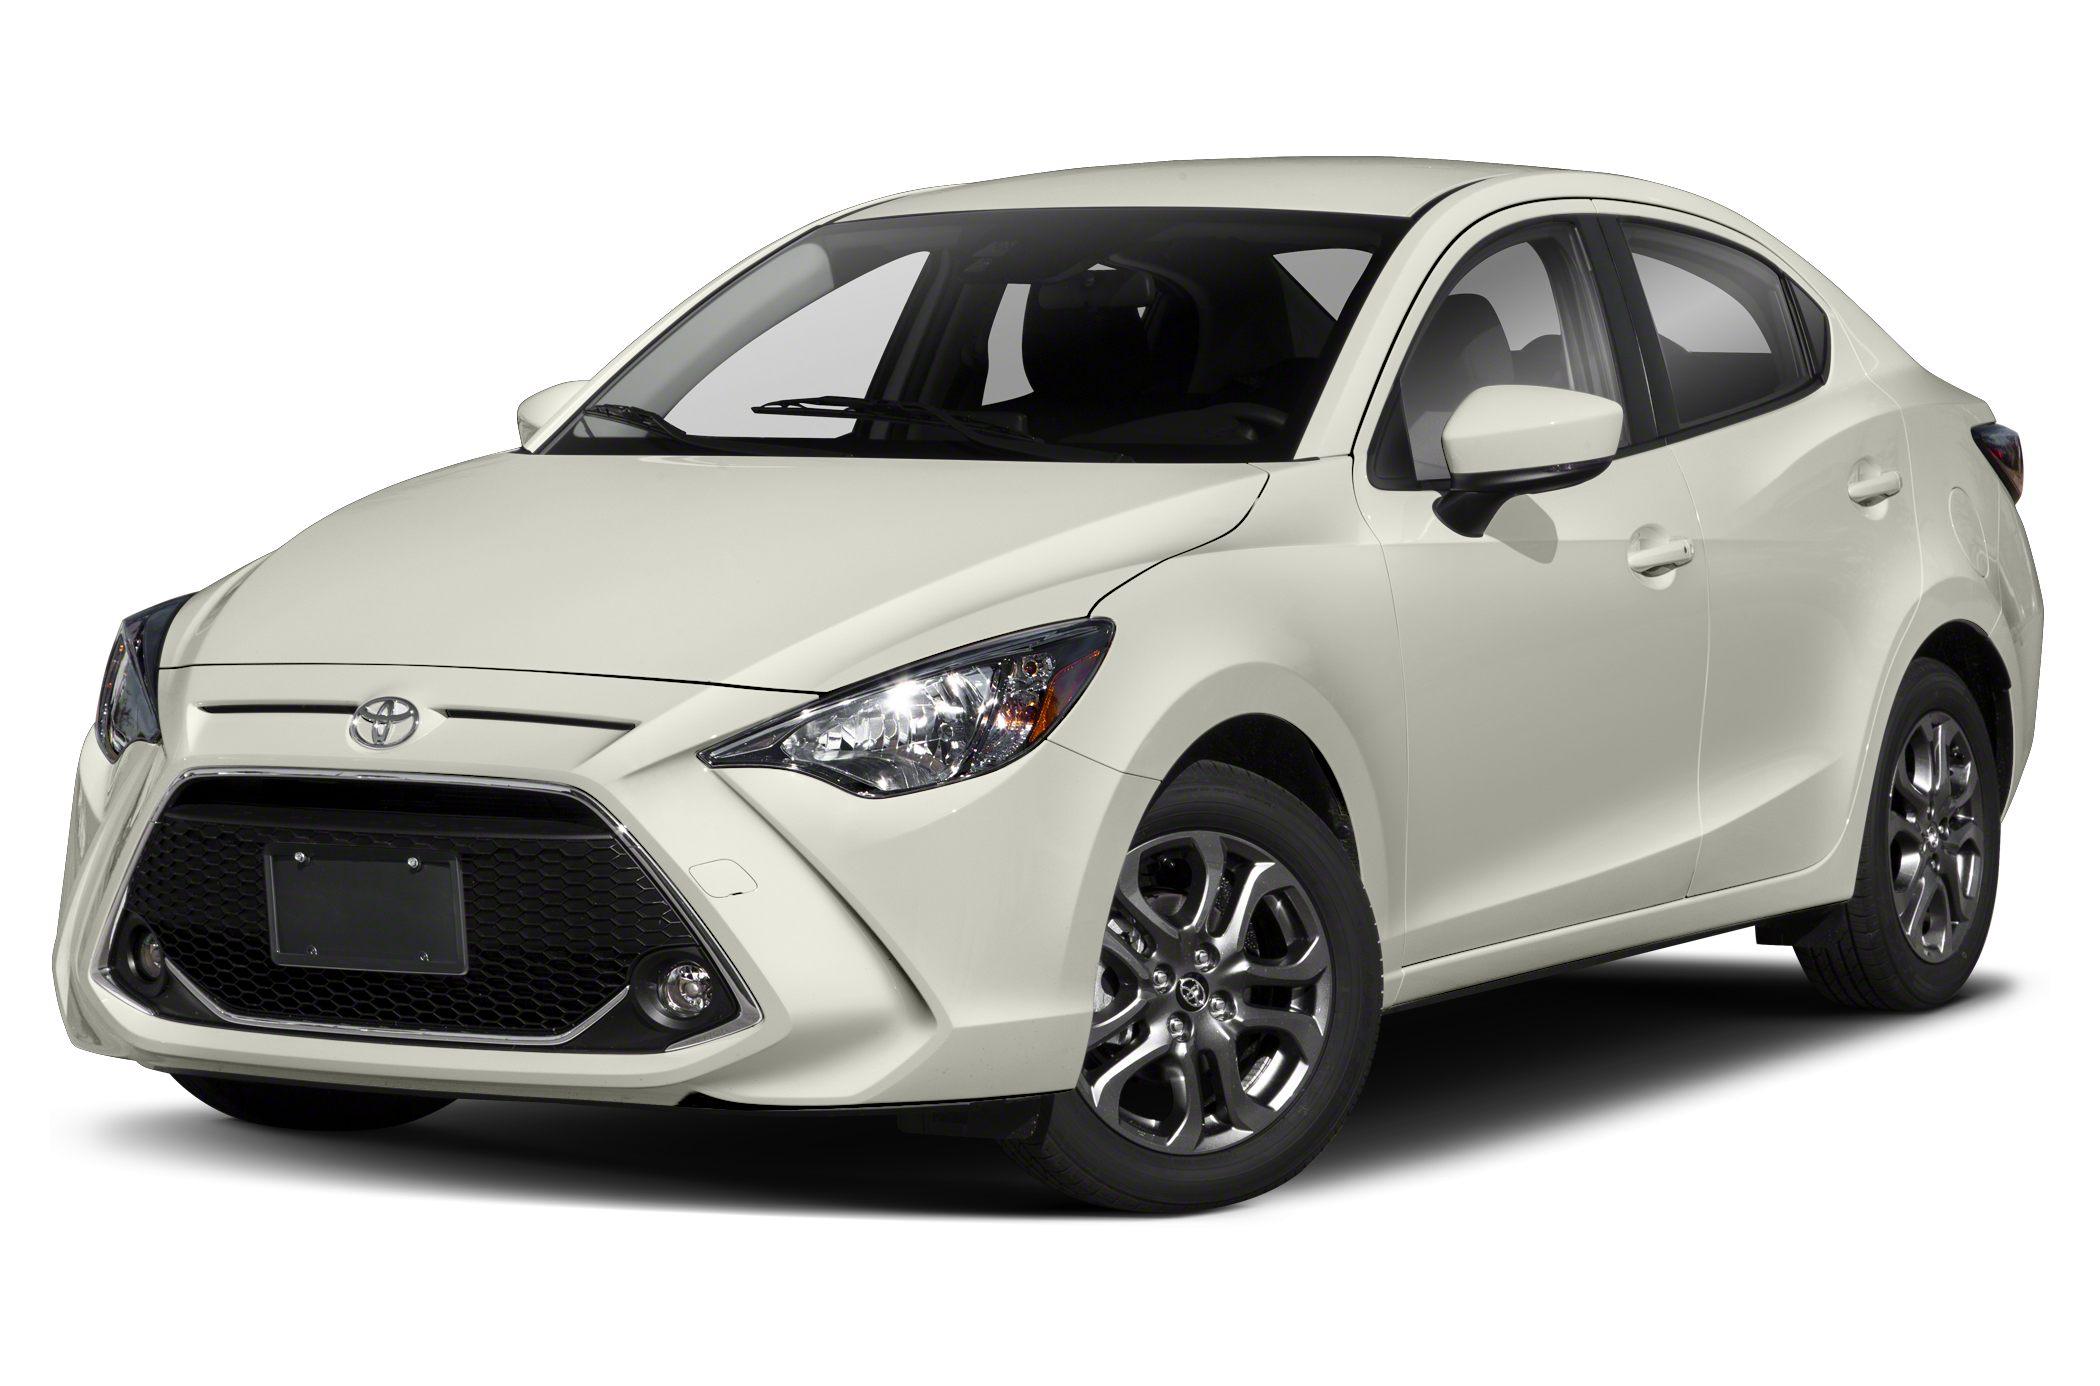 2020 Toyota Yaris Ia Review.2020 Toyota Yaris Sedan Pictures